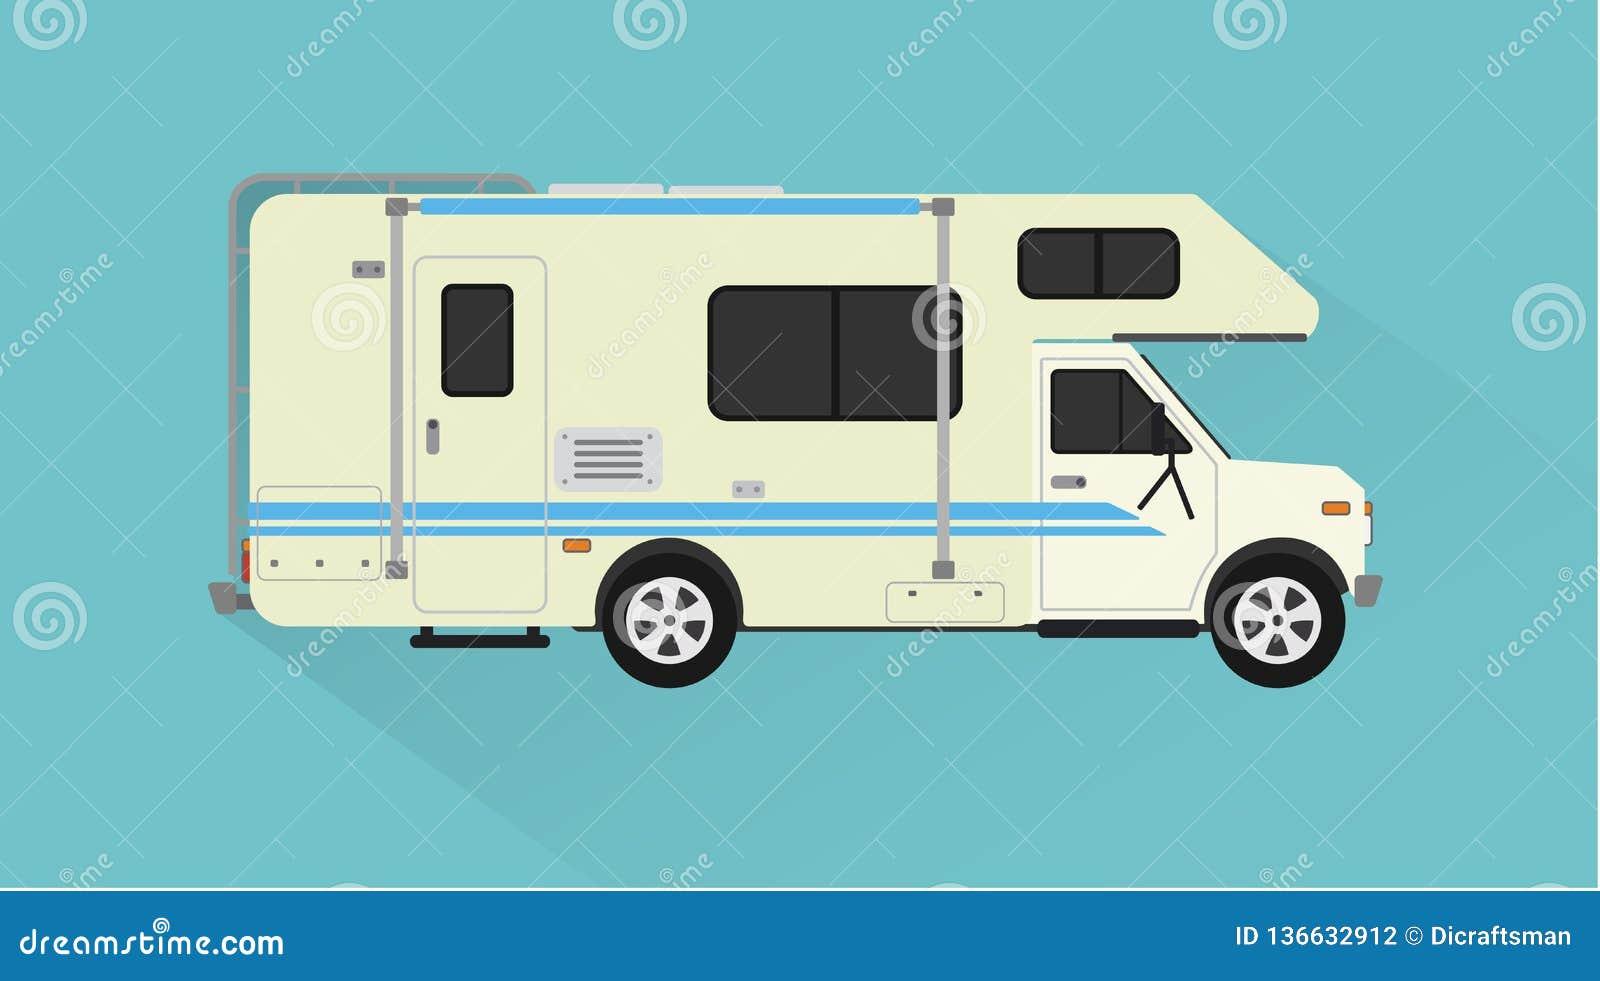 Camper, trailer car design flat style